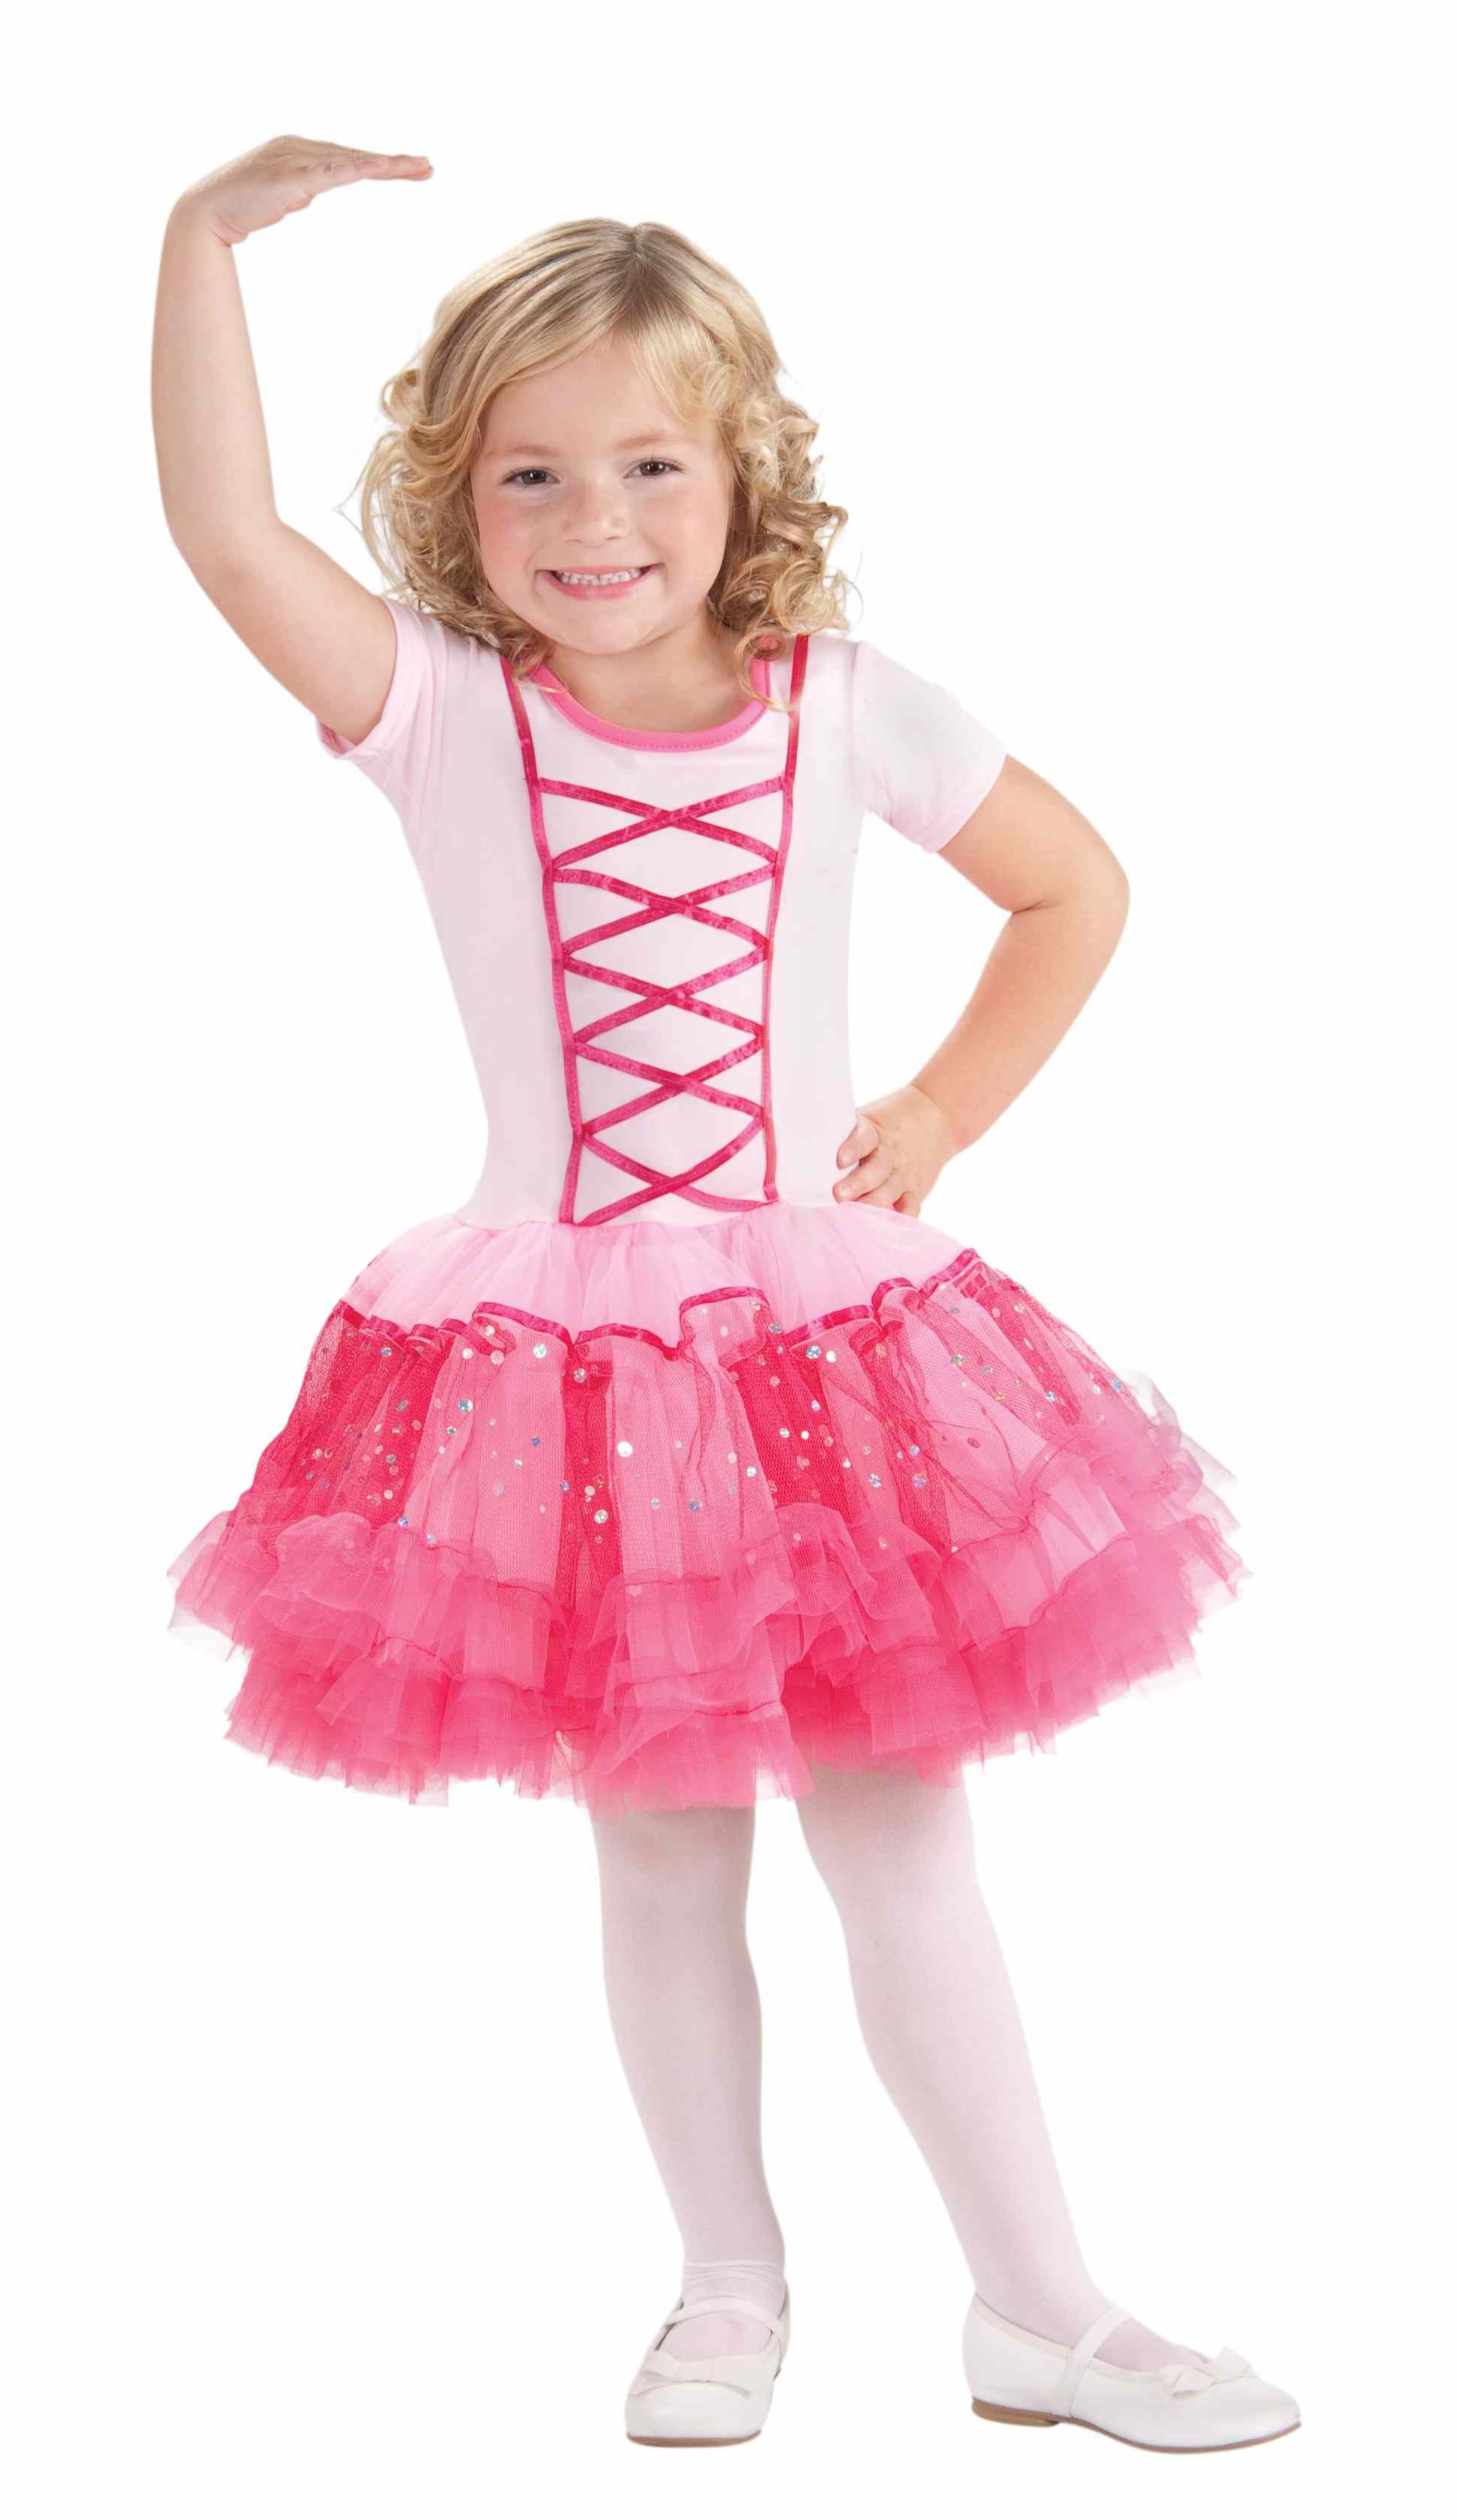 f03ed8b8fae1 Ballerina Costume